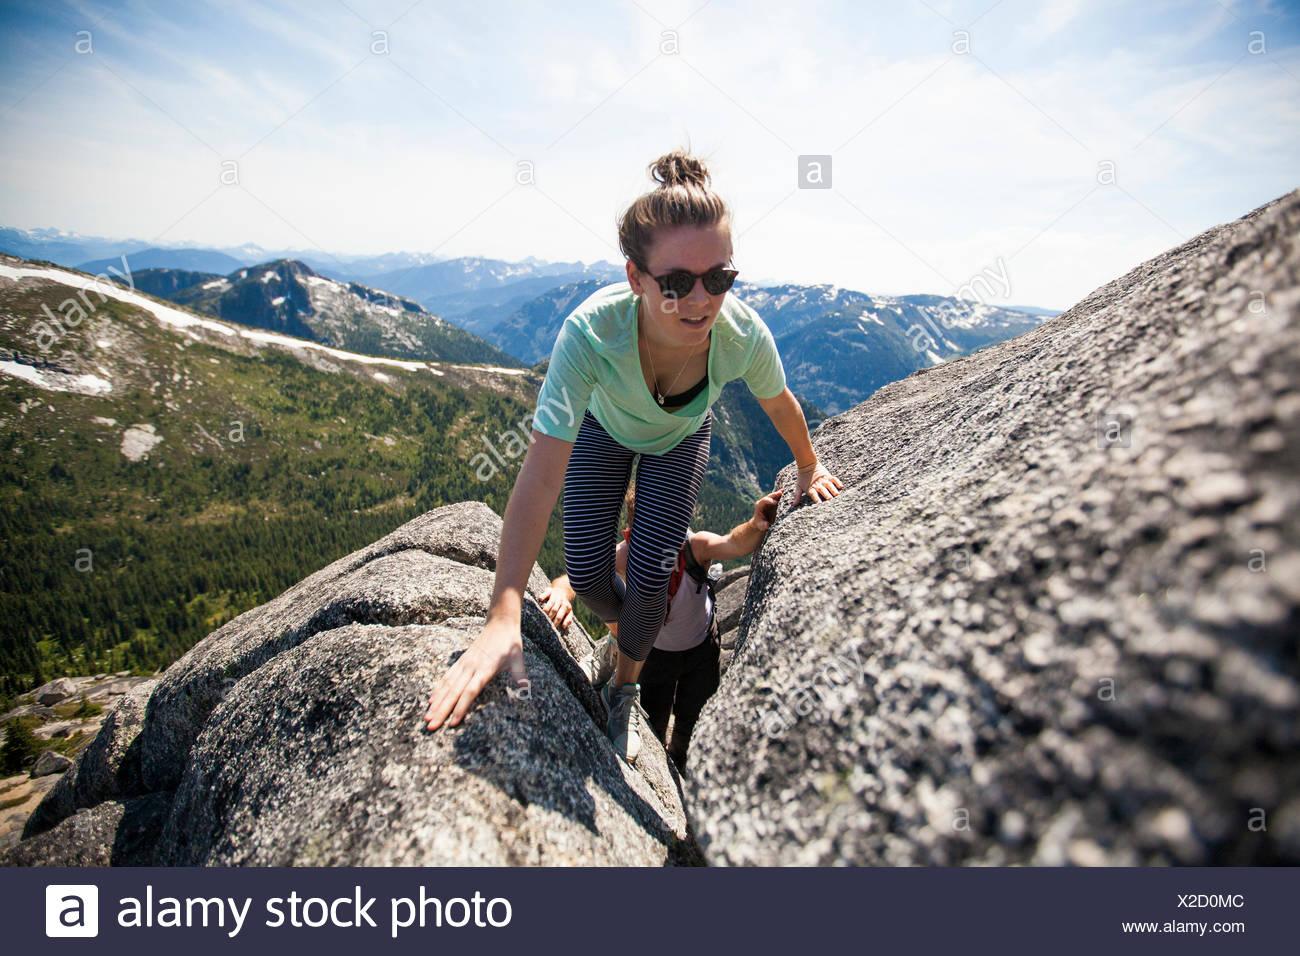 A man and woman scrambling up granite rock. - Stock Image